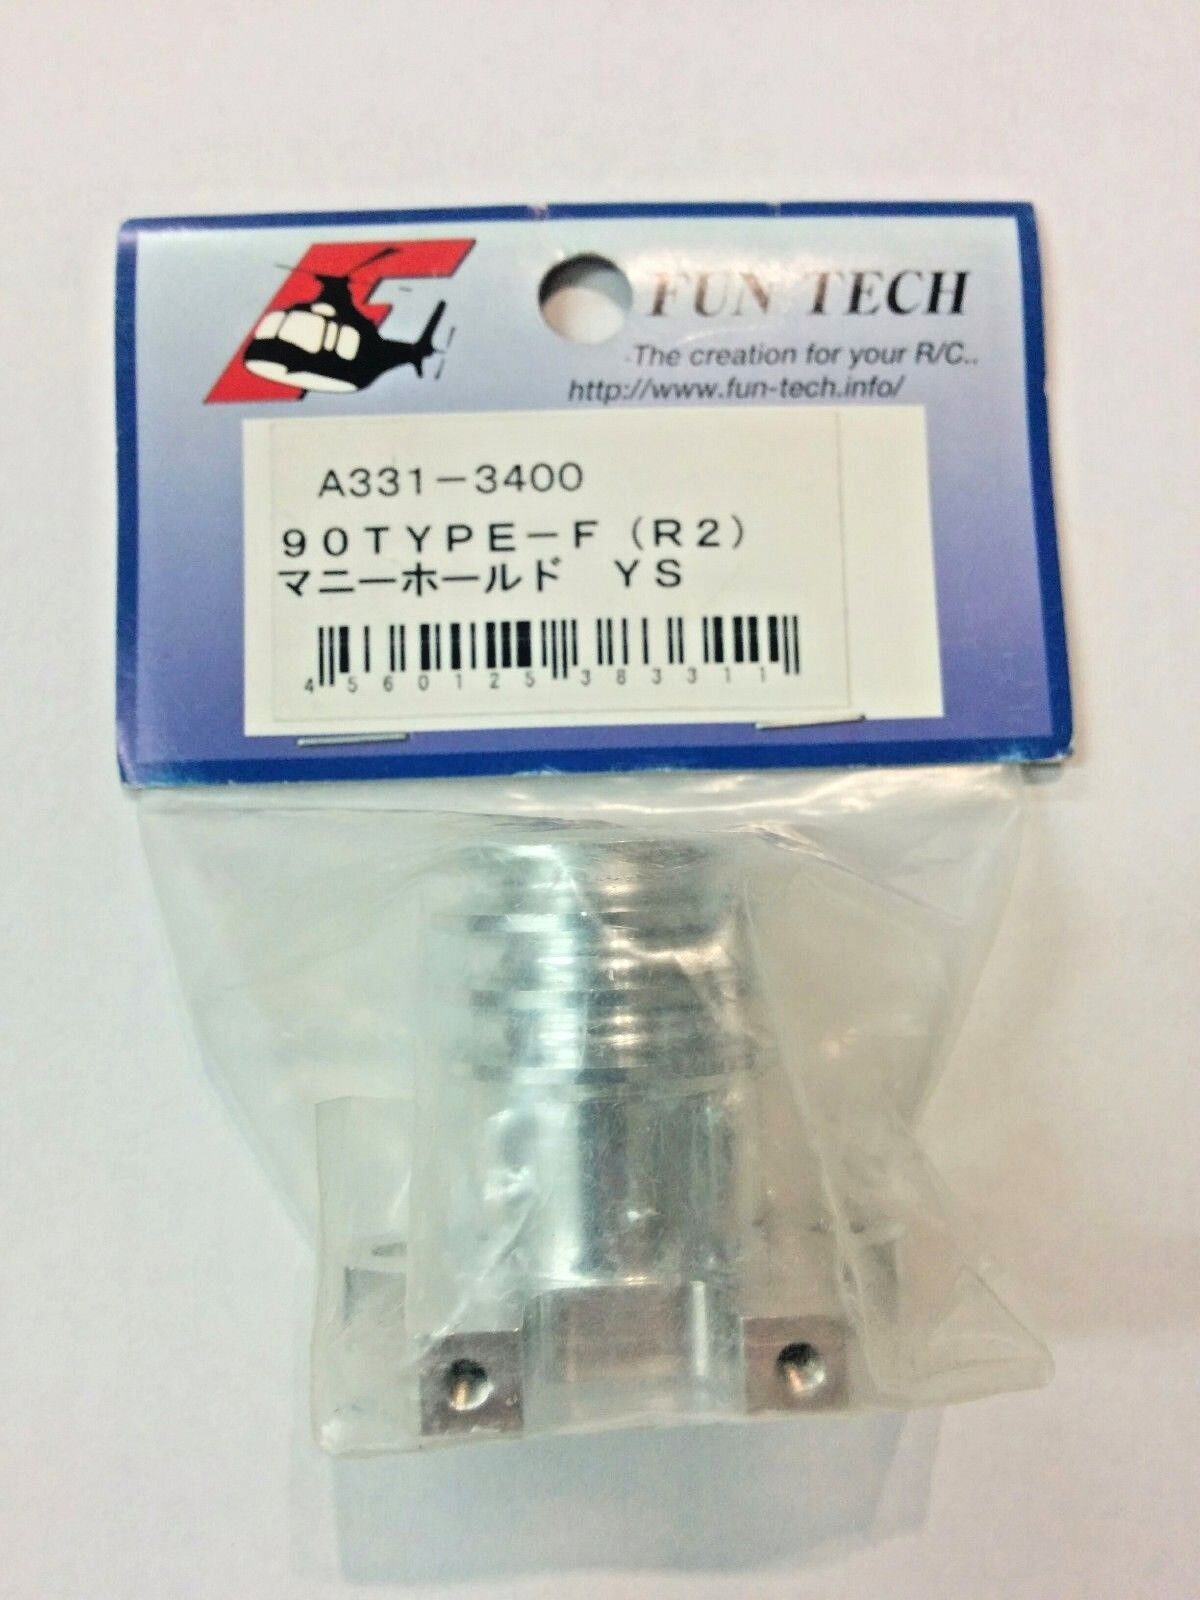 Fun Tech 90 Type-F (R2) Manifold Manifold Manifold Clamp - A331-3400 a7cc48